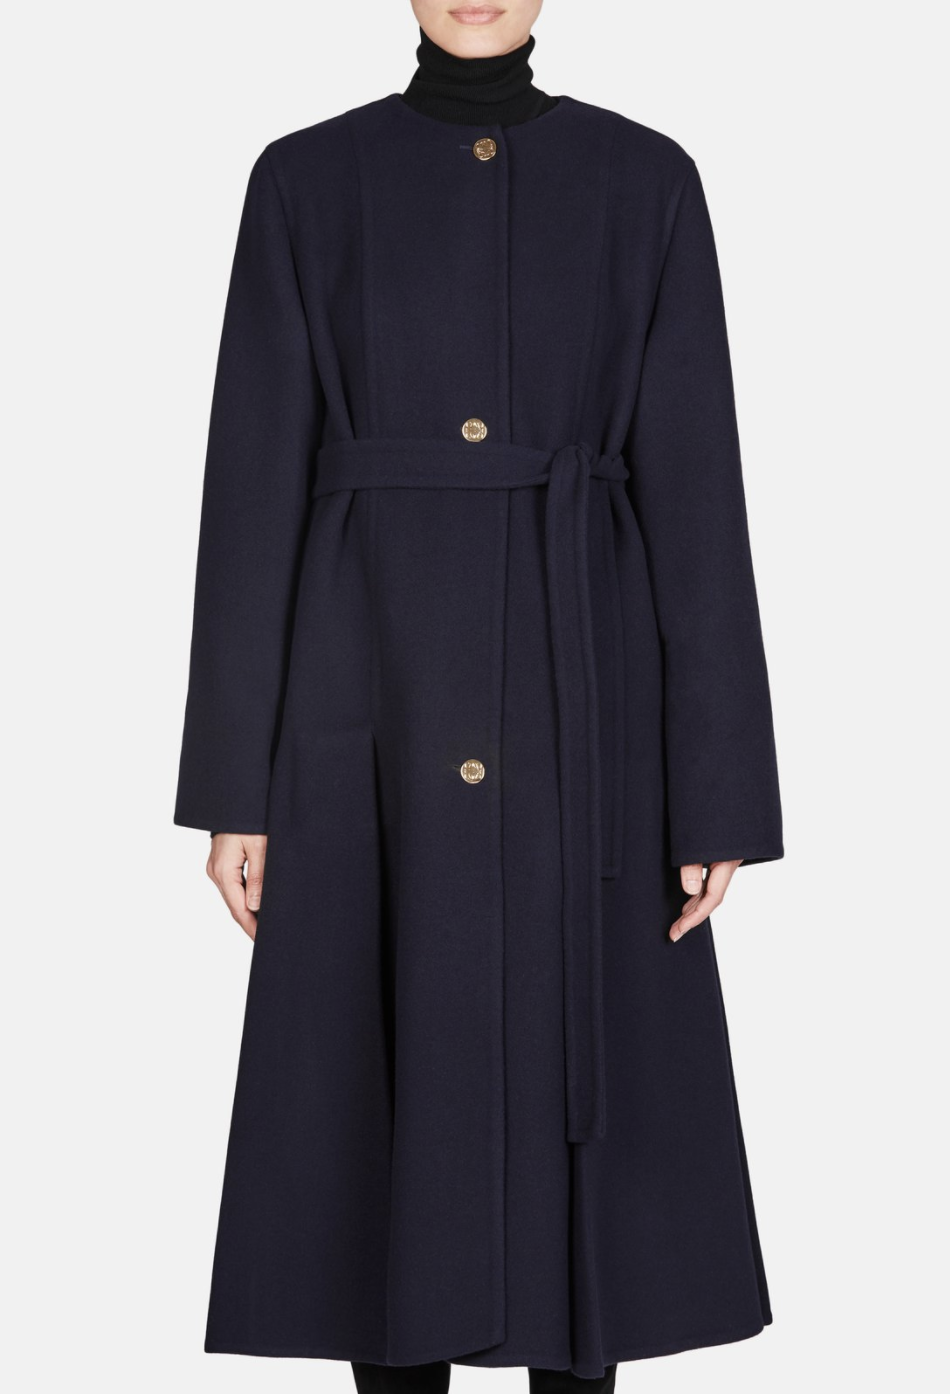 Loewe Coat, $2850 now $1211